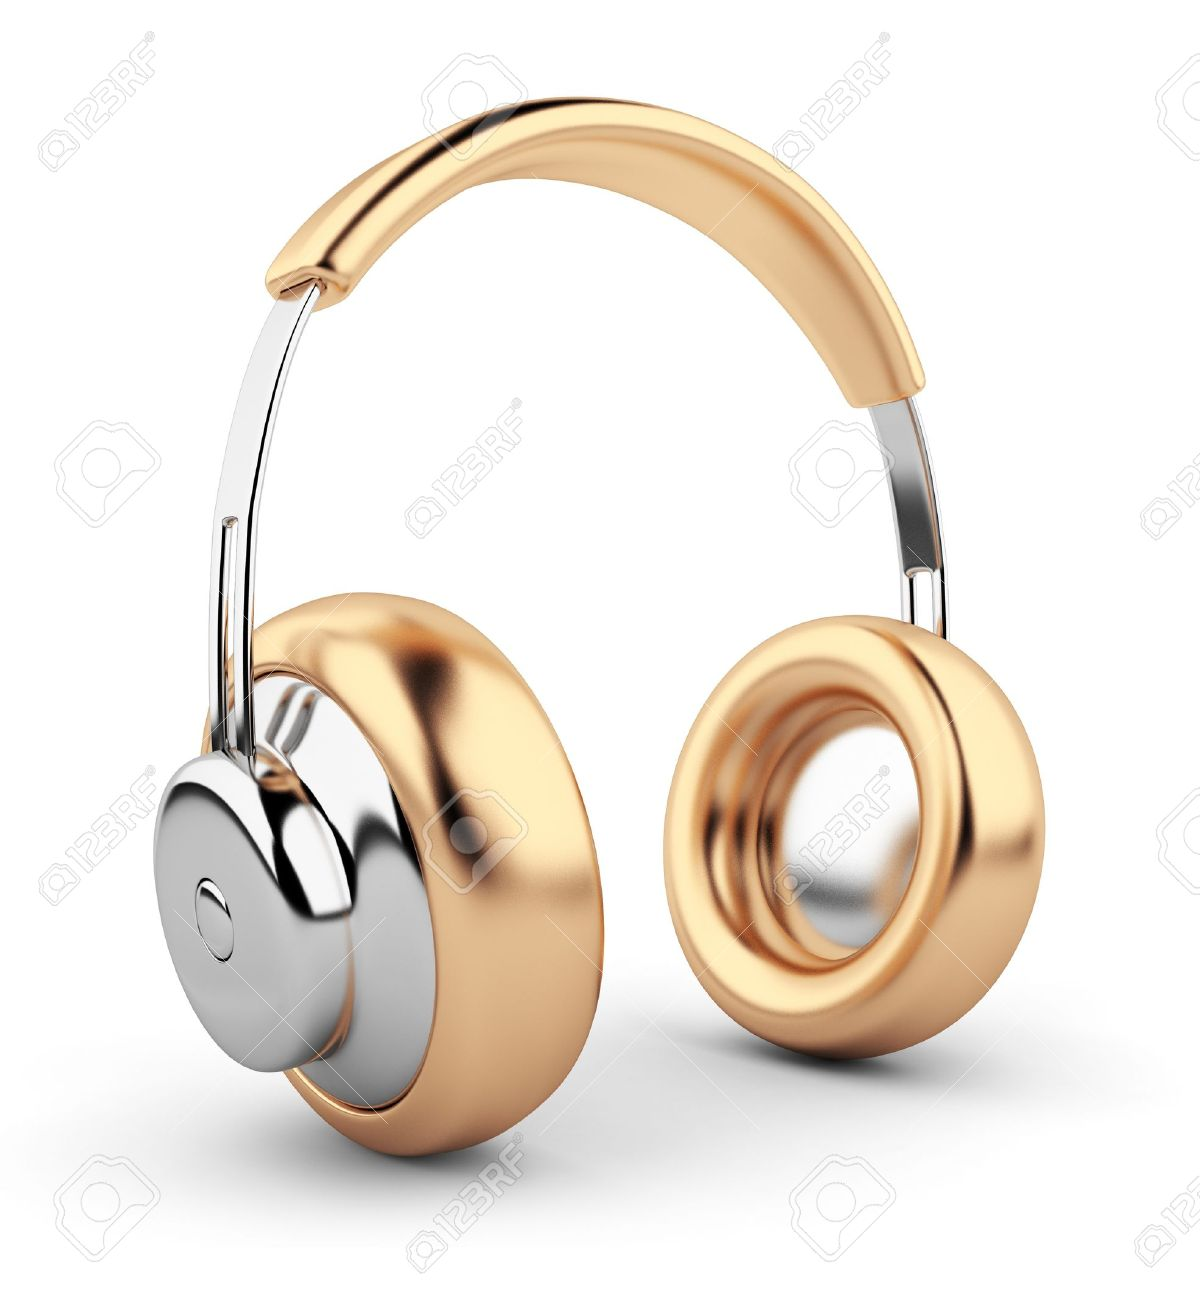 Golden headphones 3D. Icon. Isolated on white background Stock Photo - 12956888